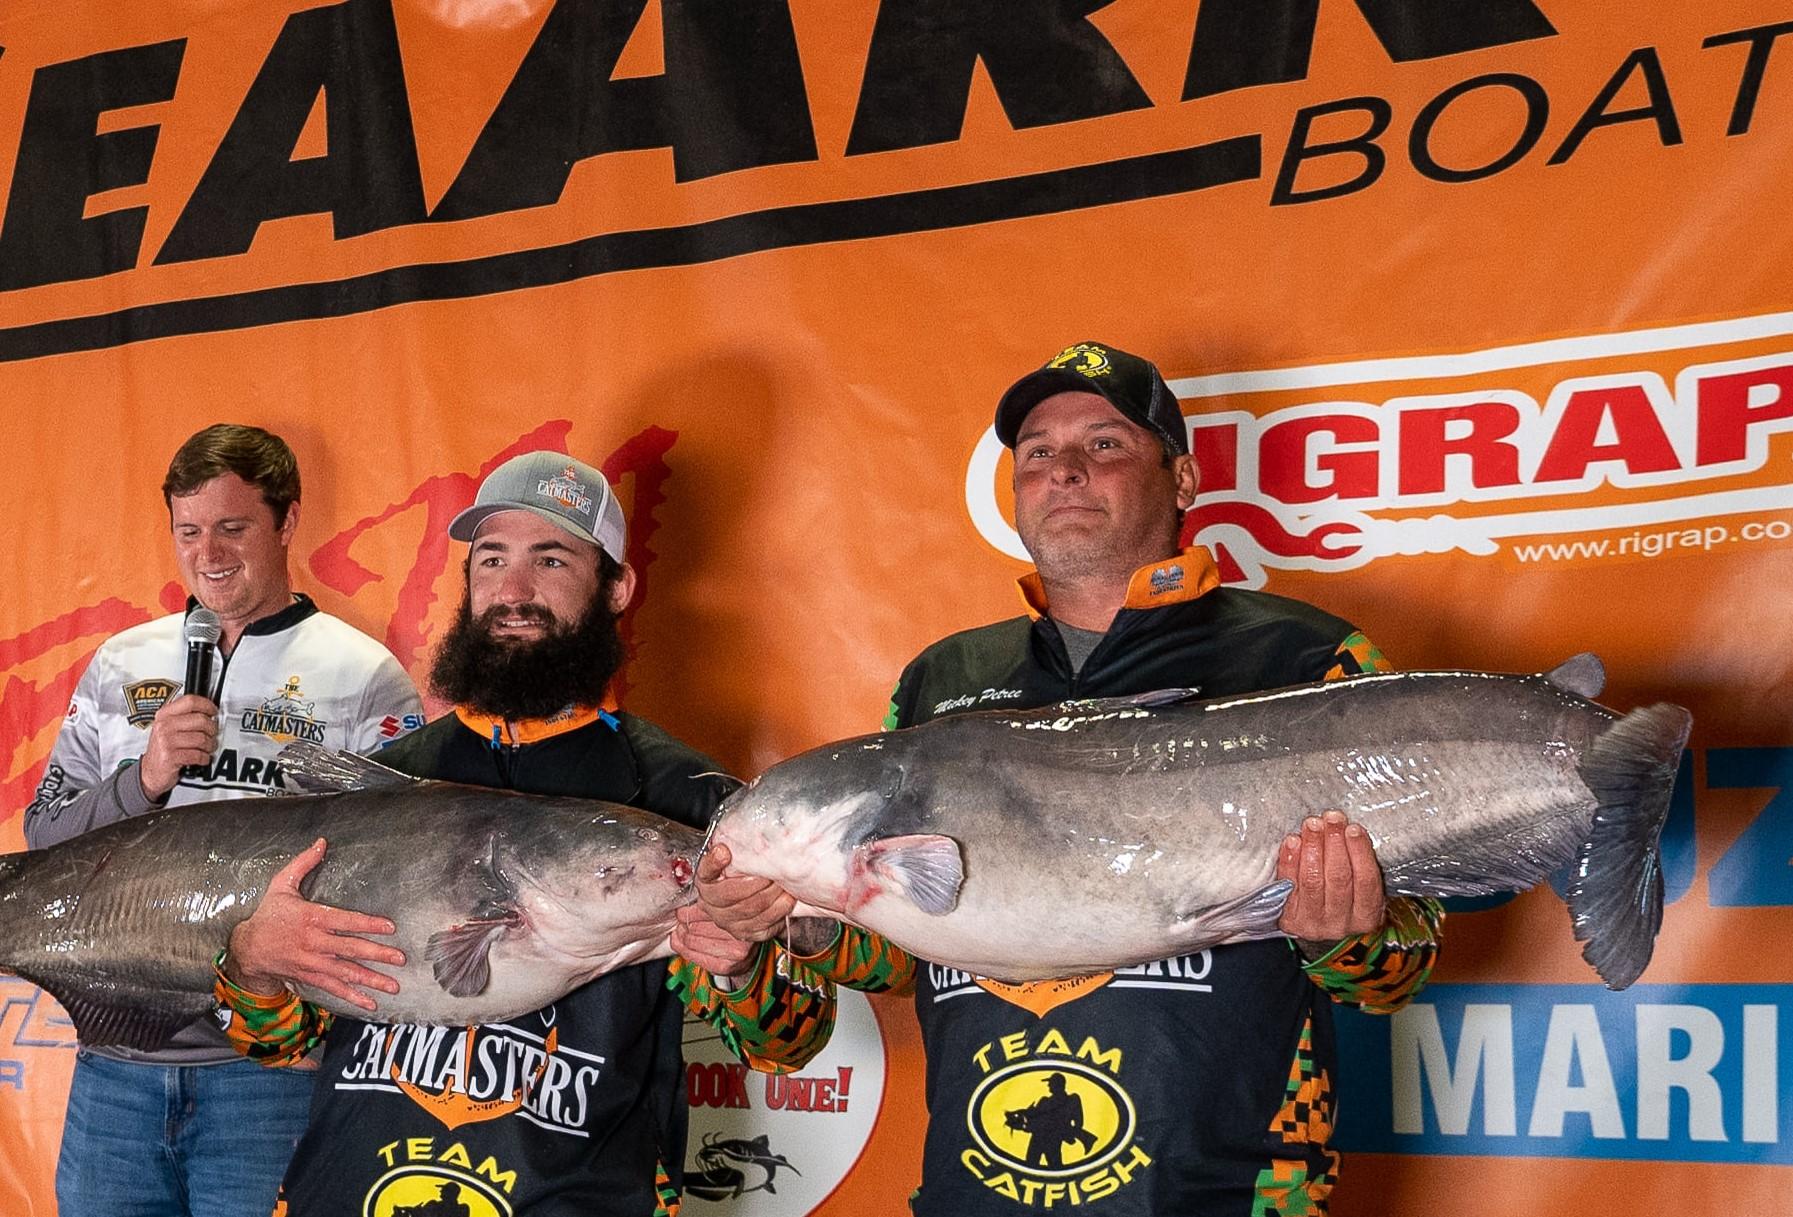 catfish, tournament, Catmasters, Oklahoma, Texoma, Mick Petree, Smoky Brown, BnM Poles, SeaArk Boats